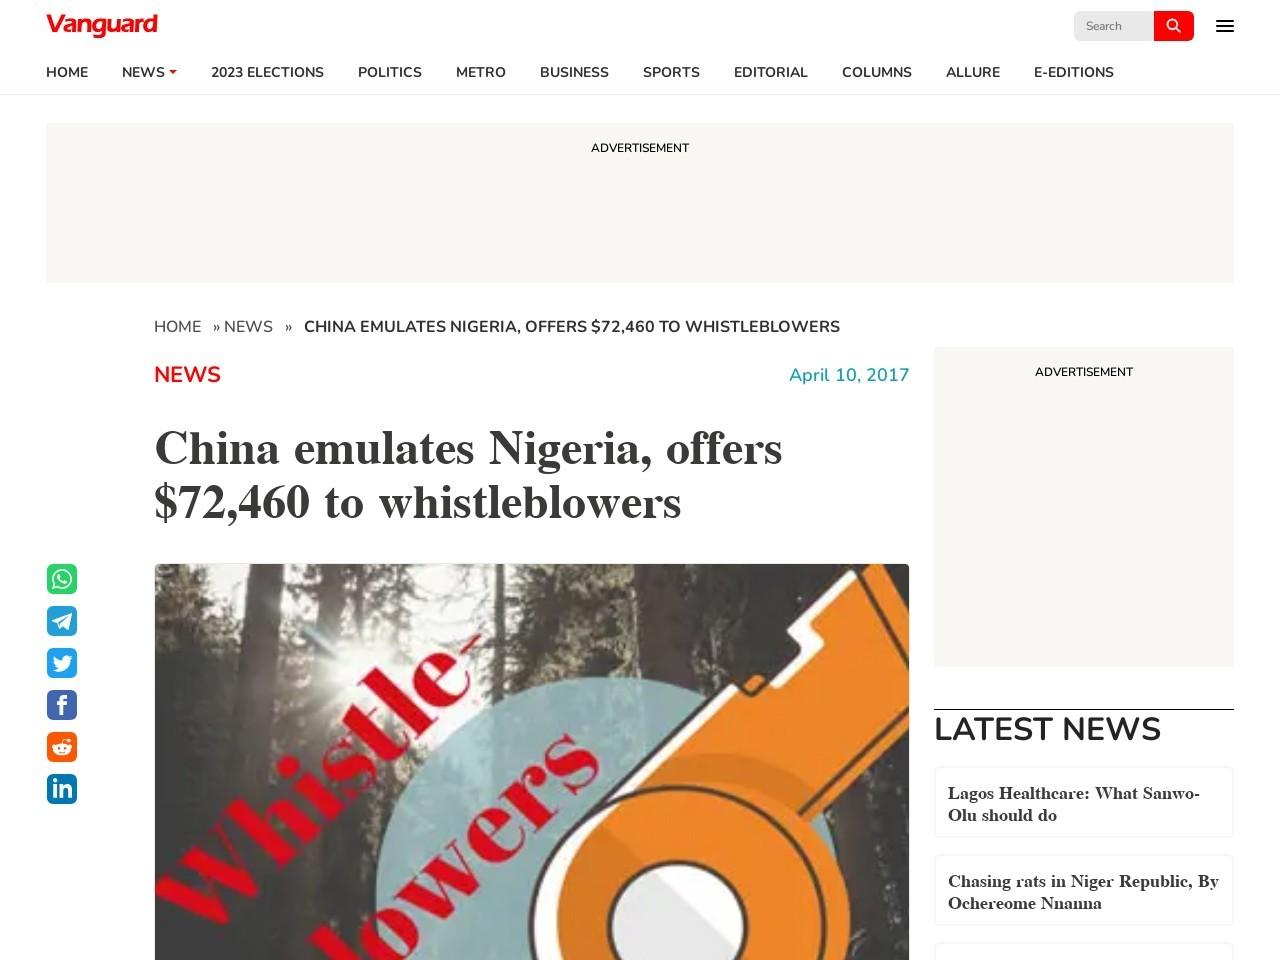 China emulates Nigeria, offers $72,460 to whistleblowers